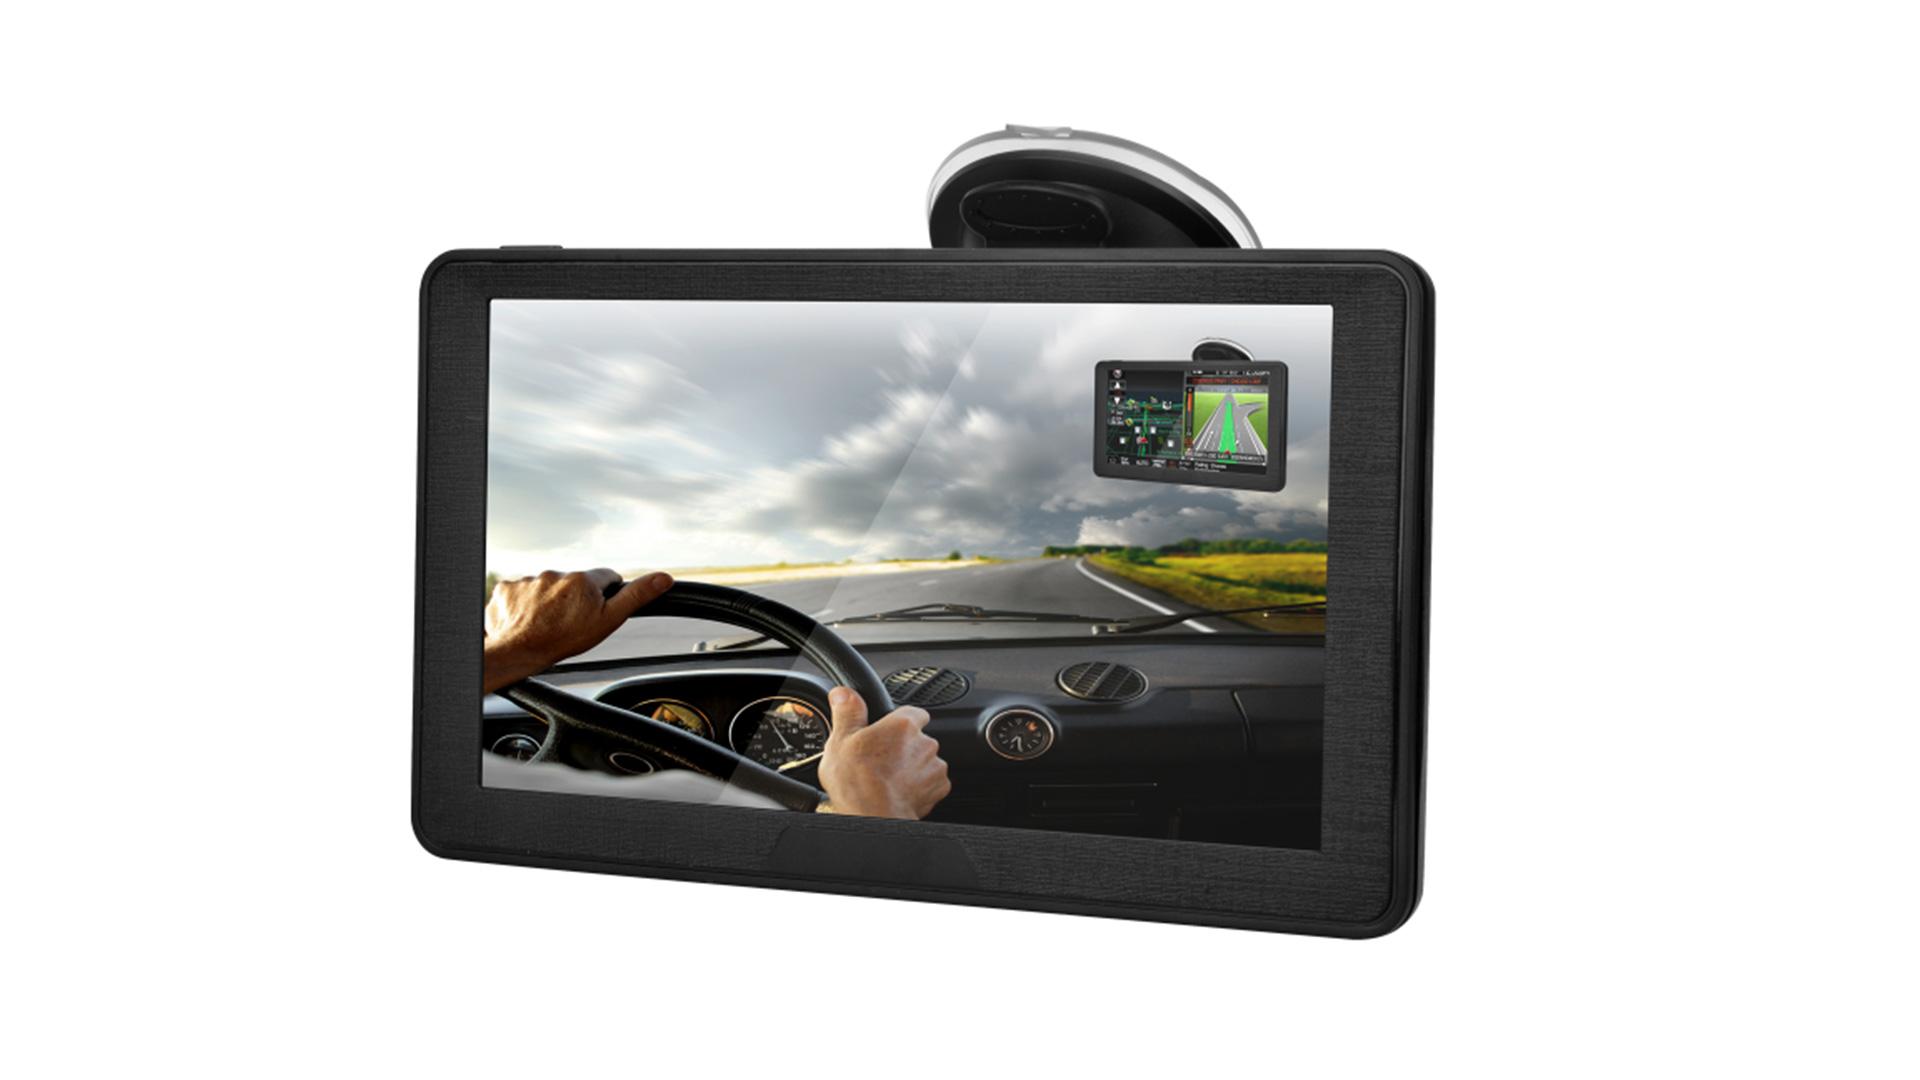 Professional CAR GPS manufacturers